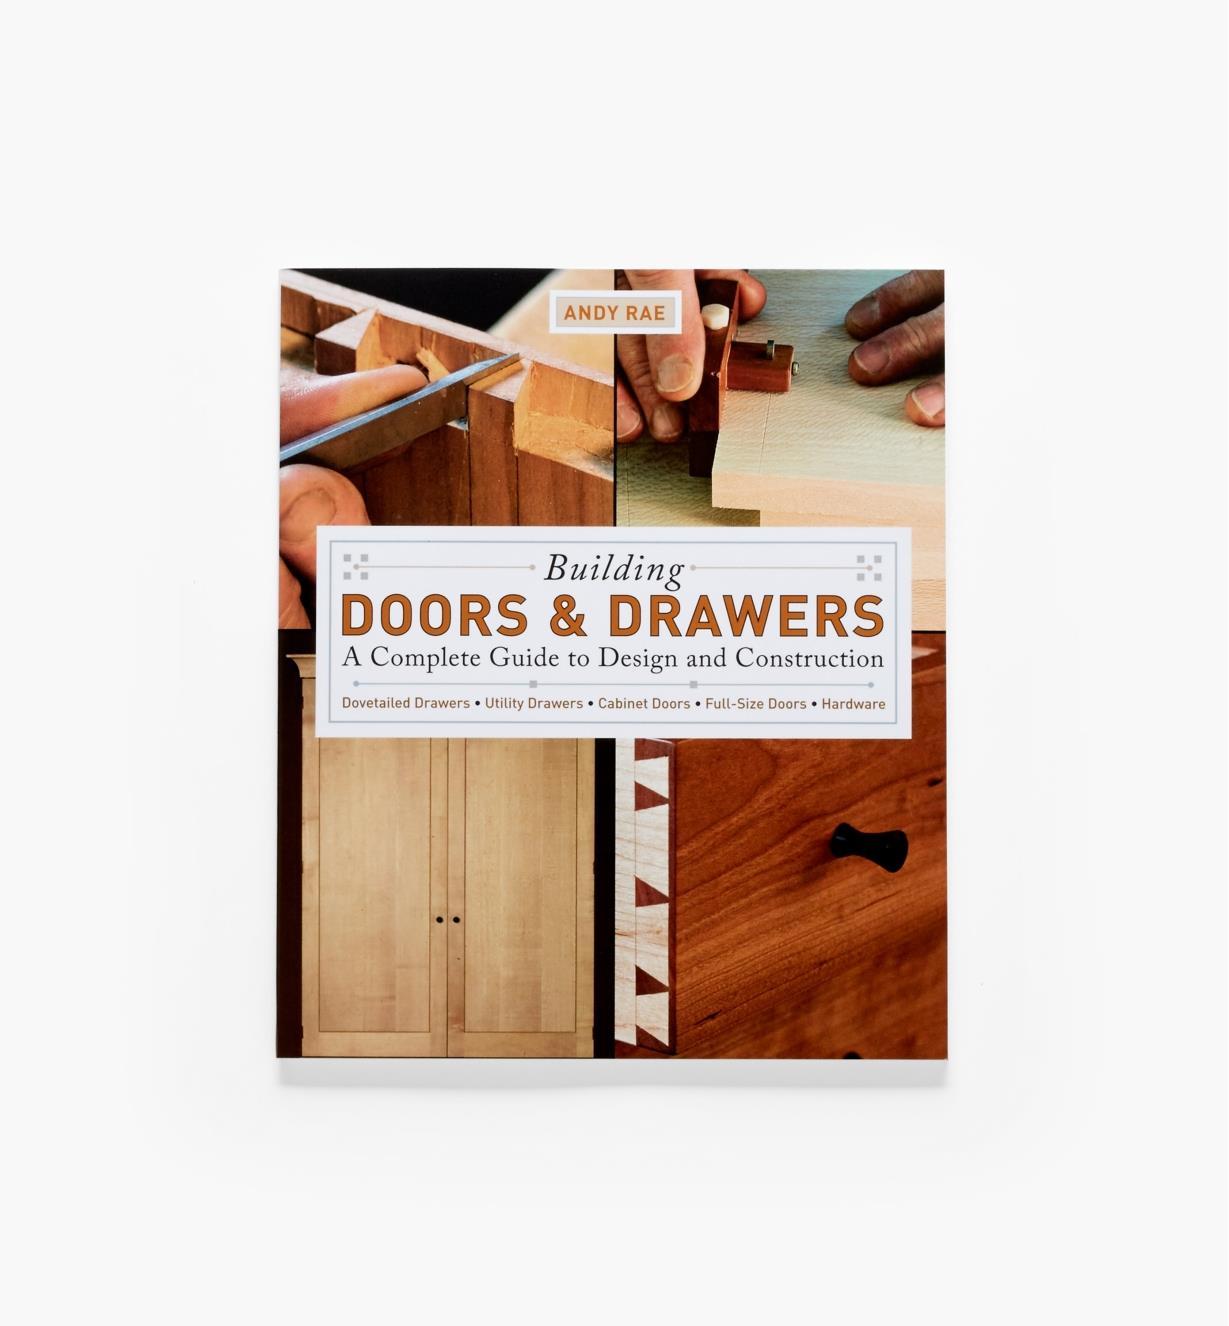 73L0268 - Building Doors & Drawers - Book